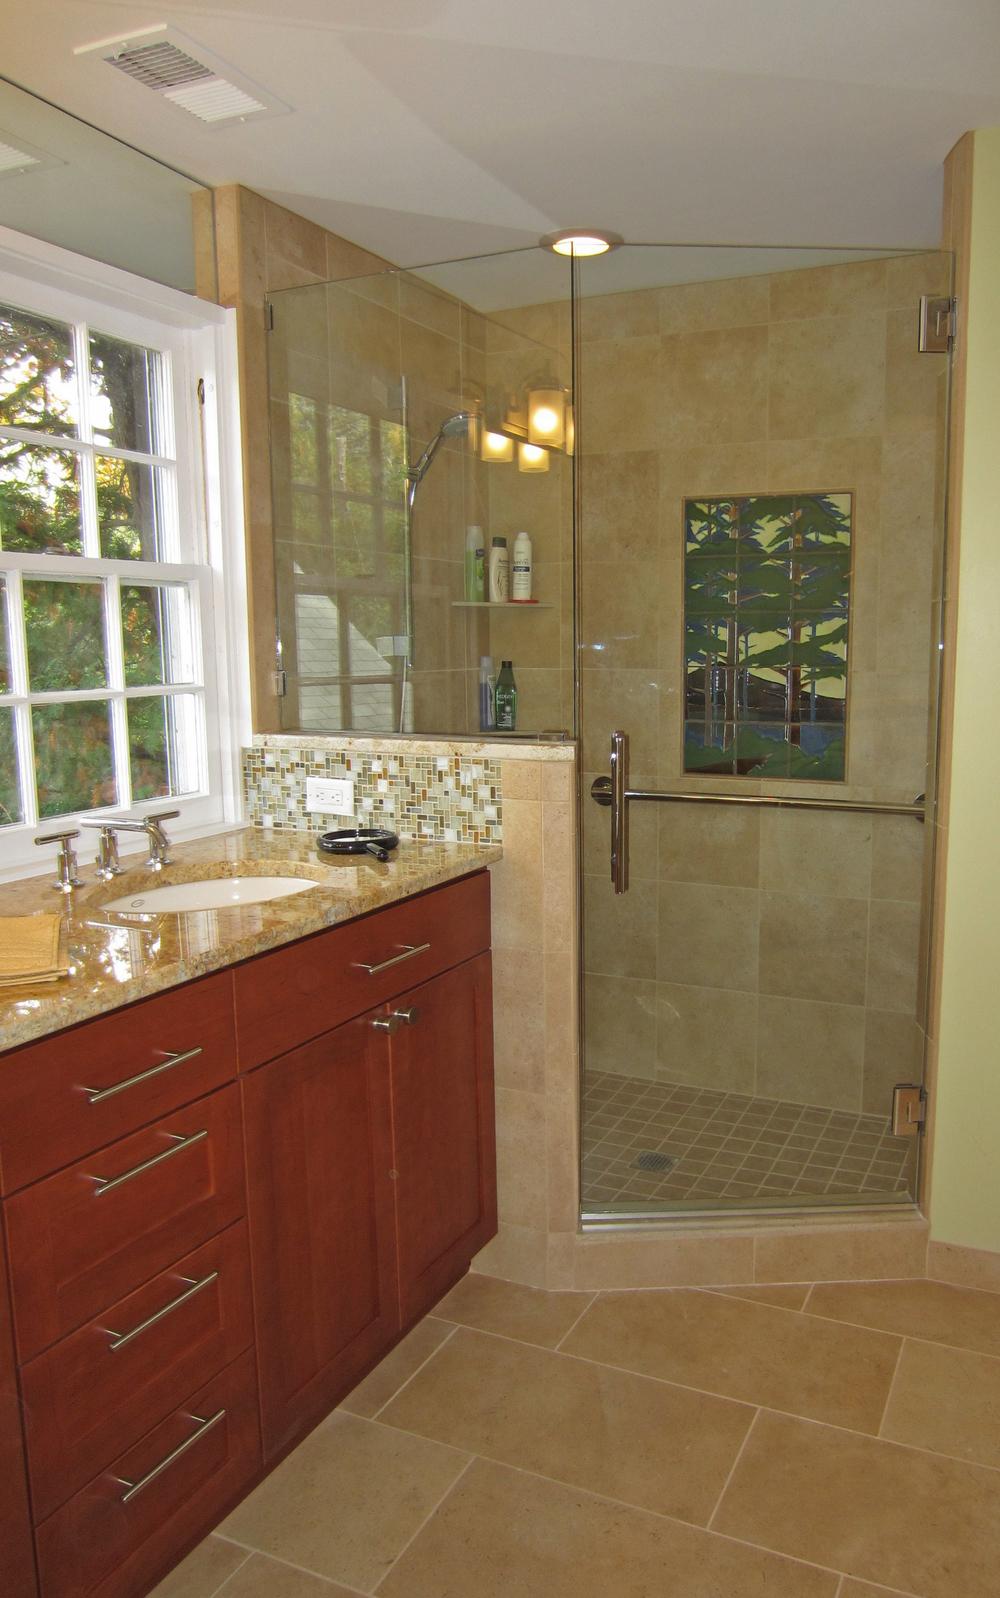 Bathrooms_26.JPG